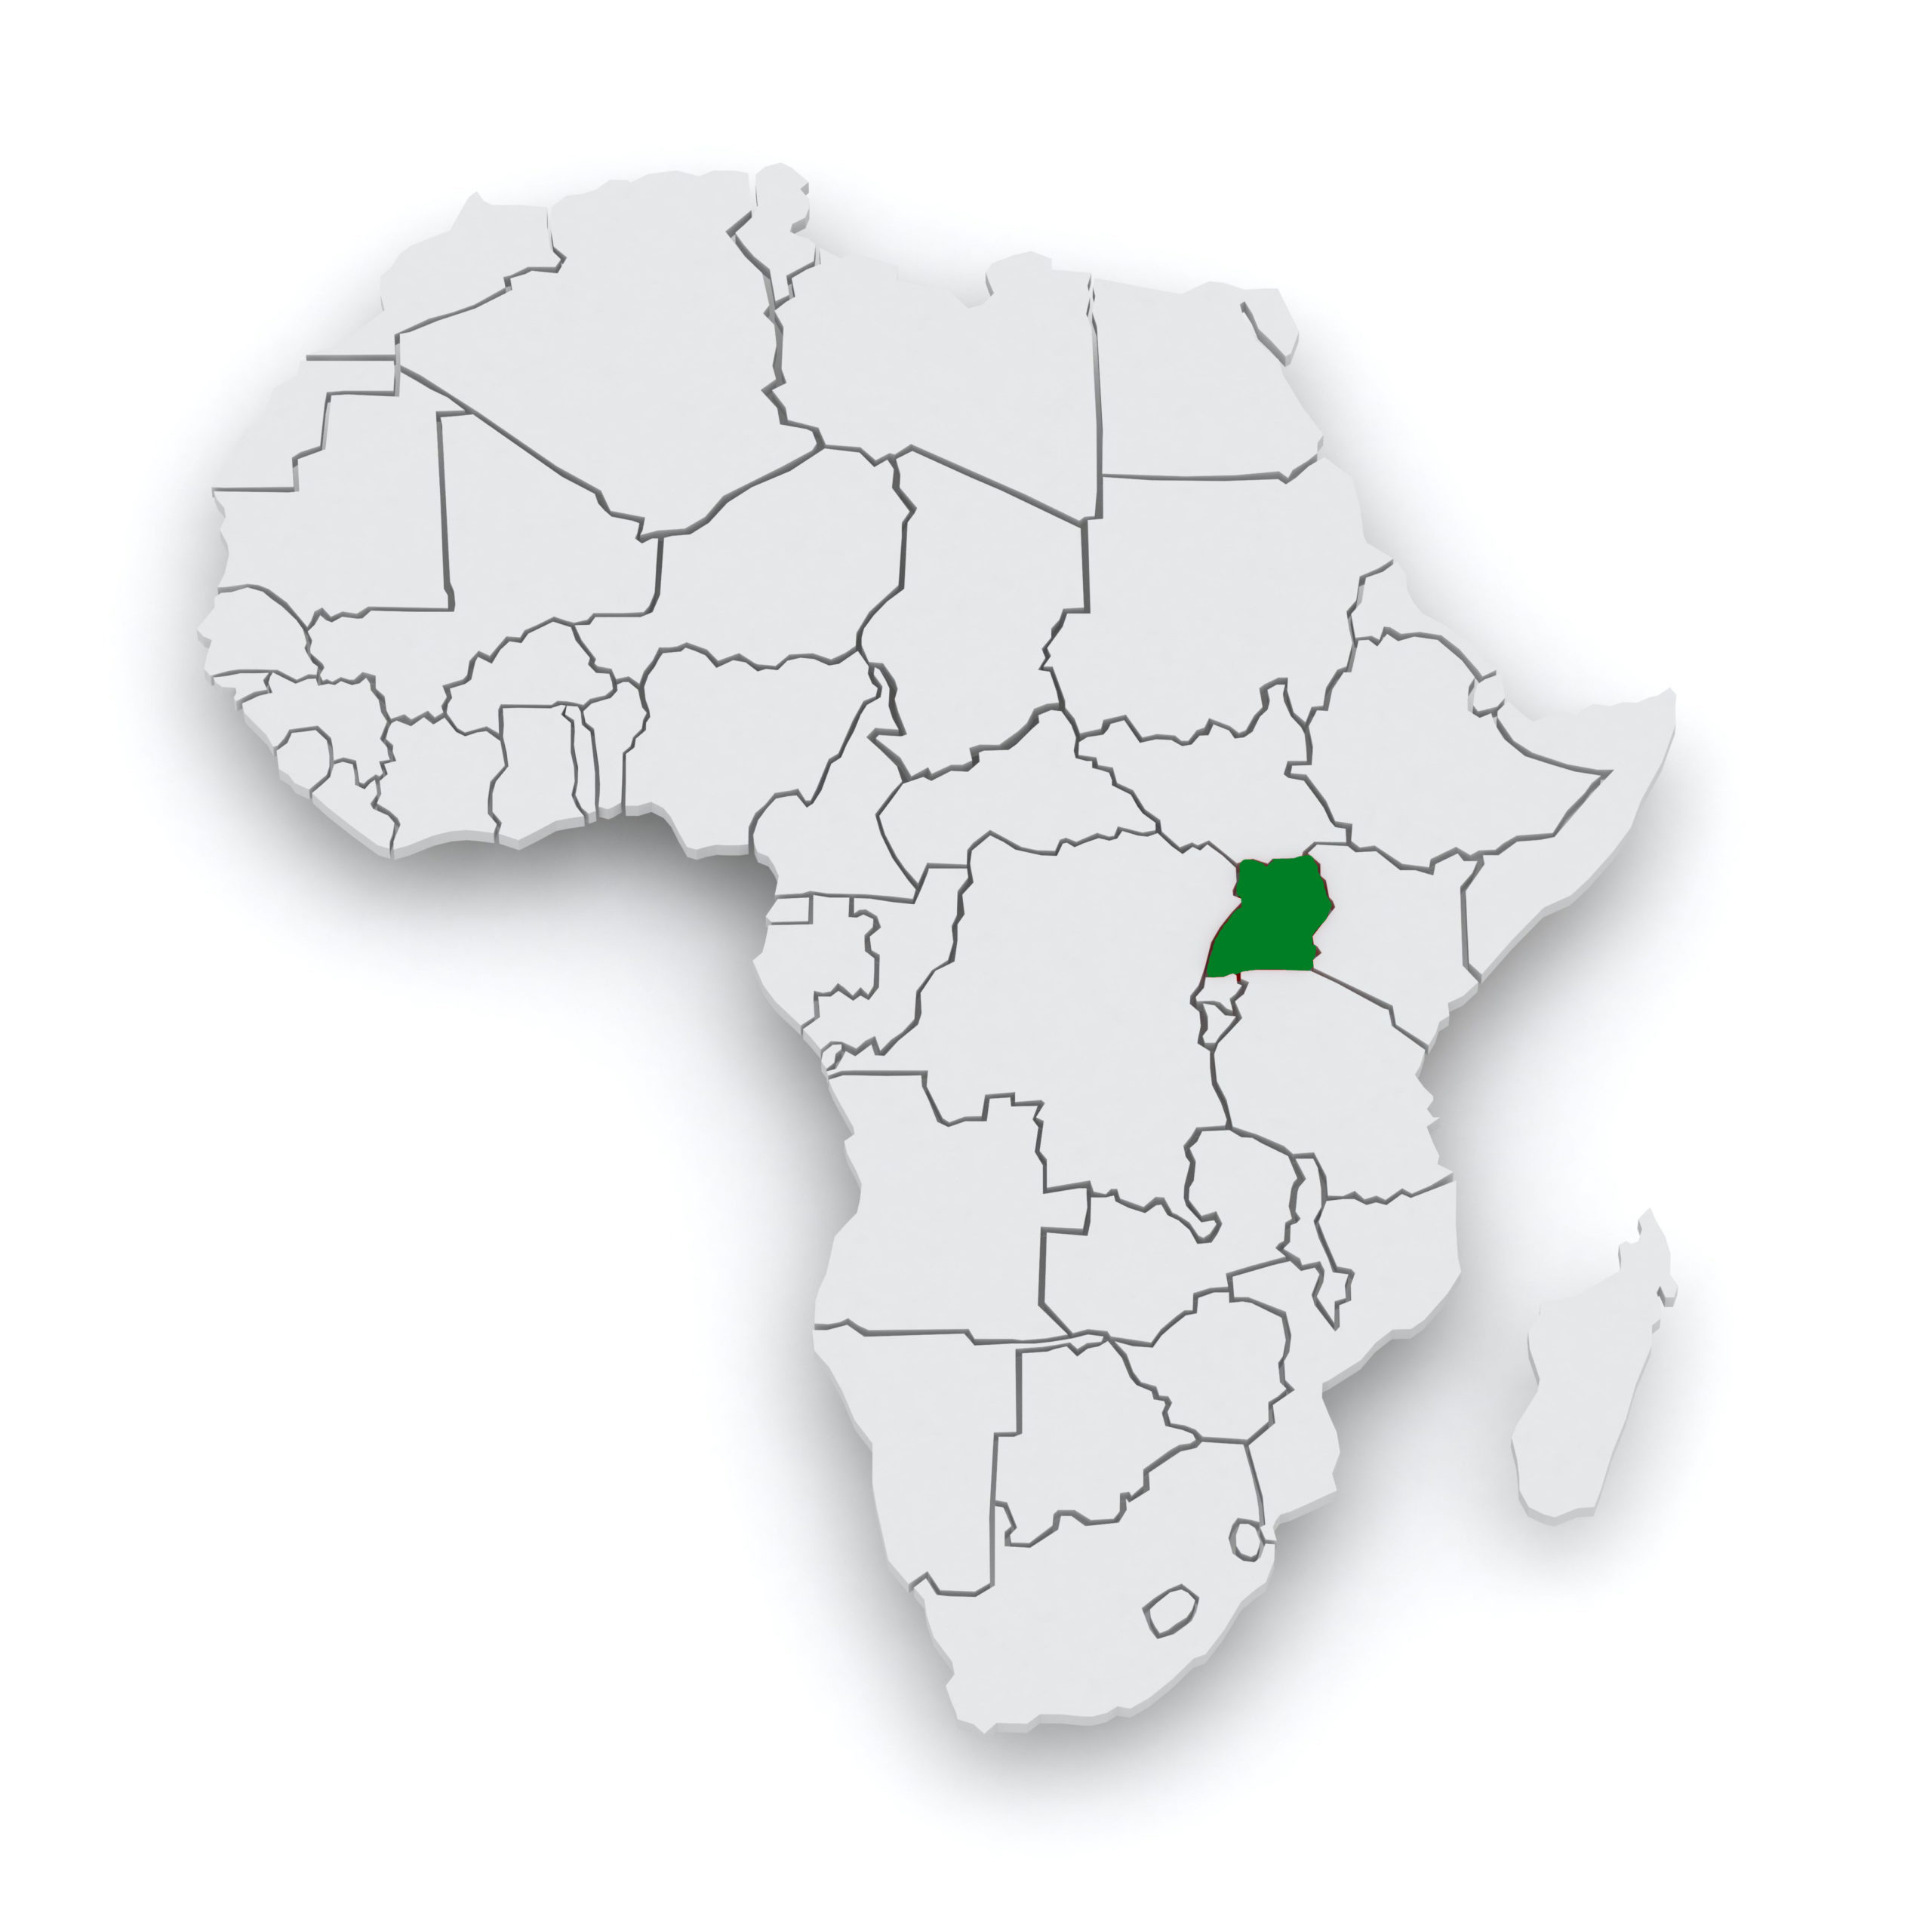 bigstock-Map-of-worlds-Uganda-d-69184330-square